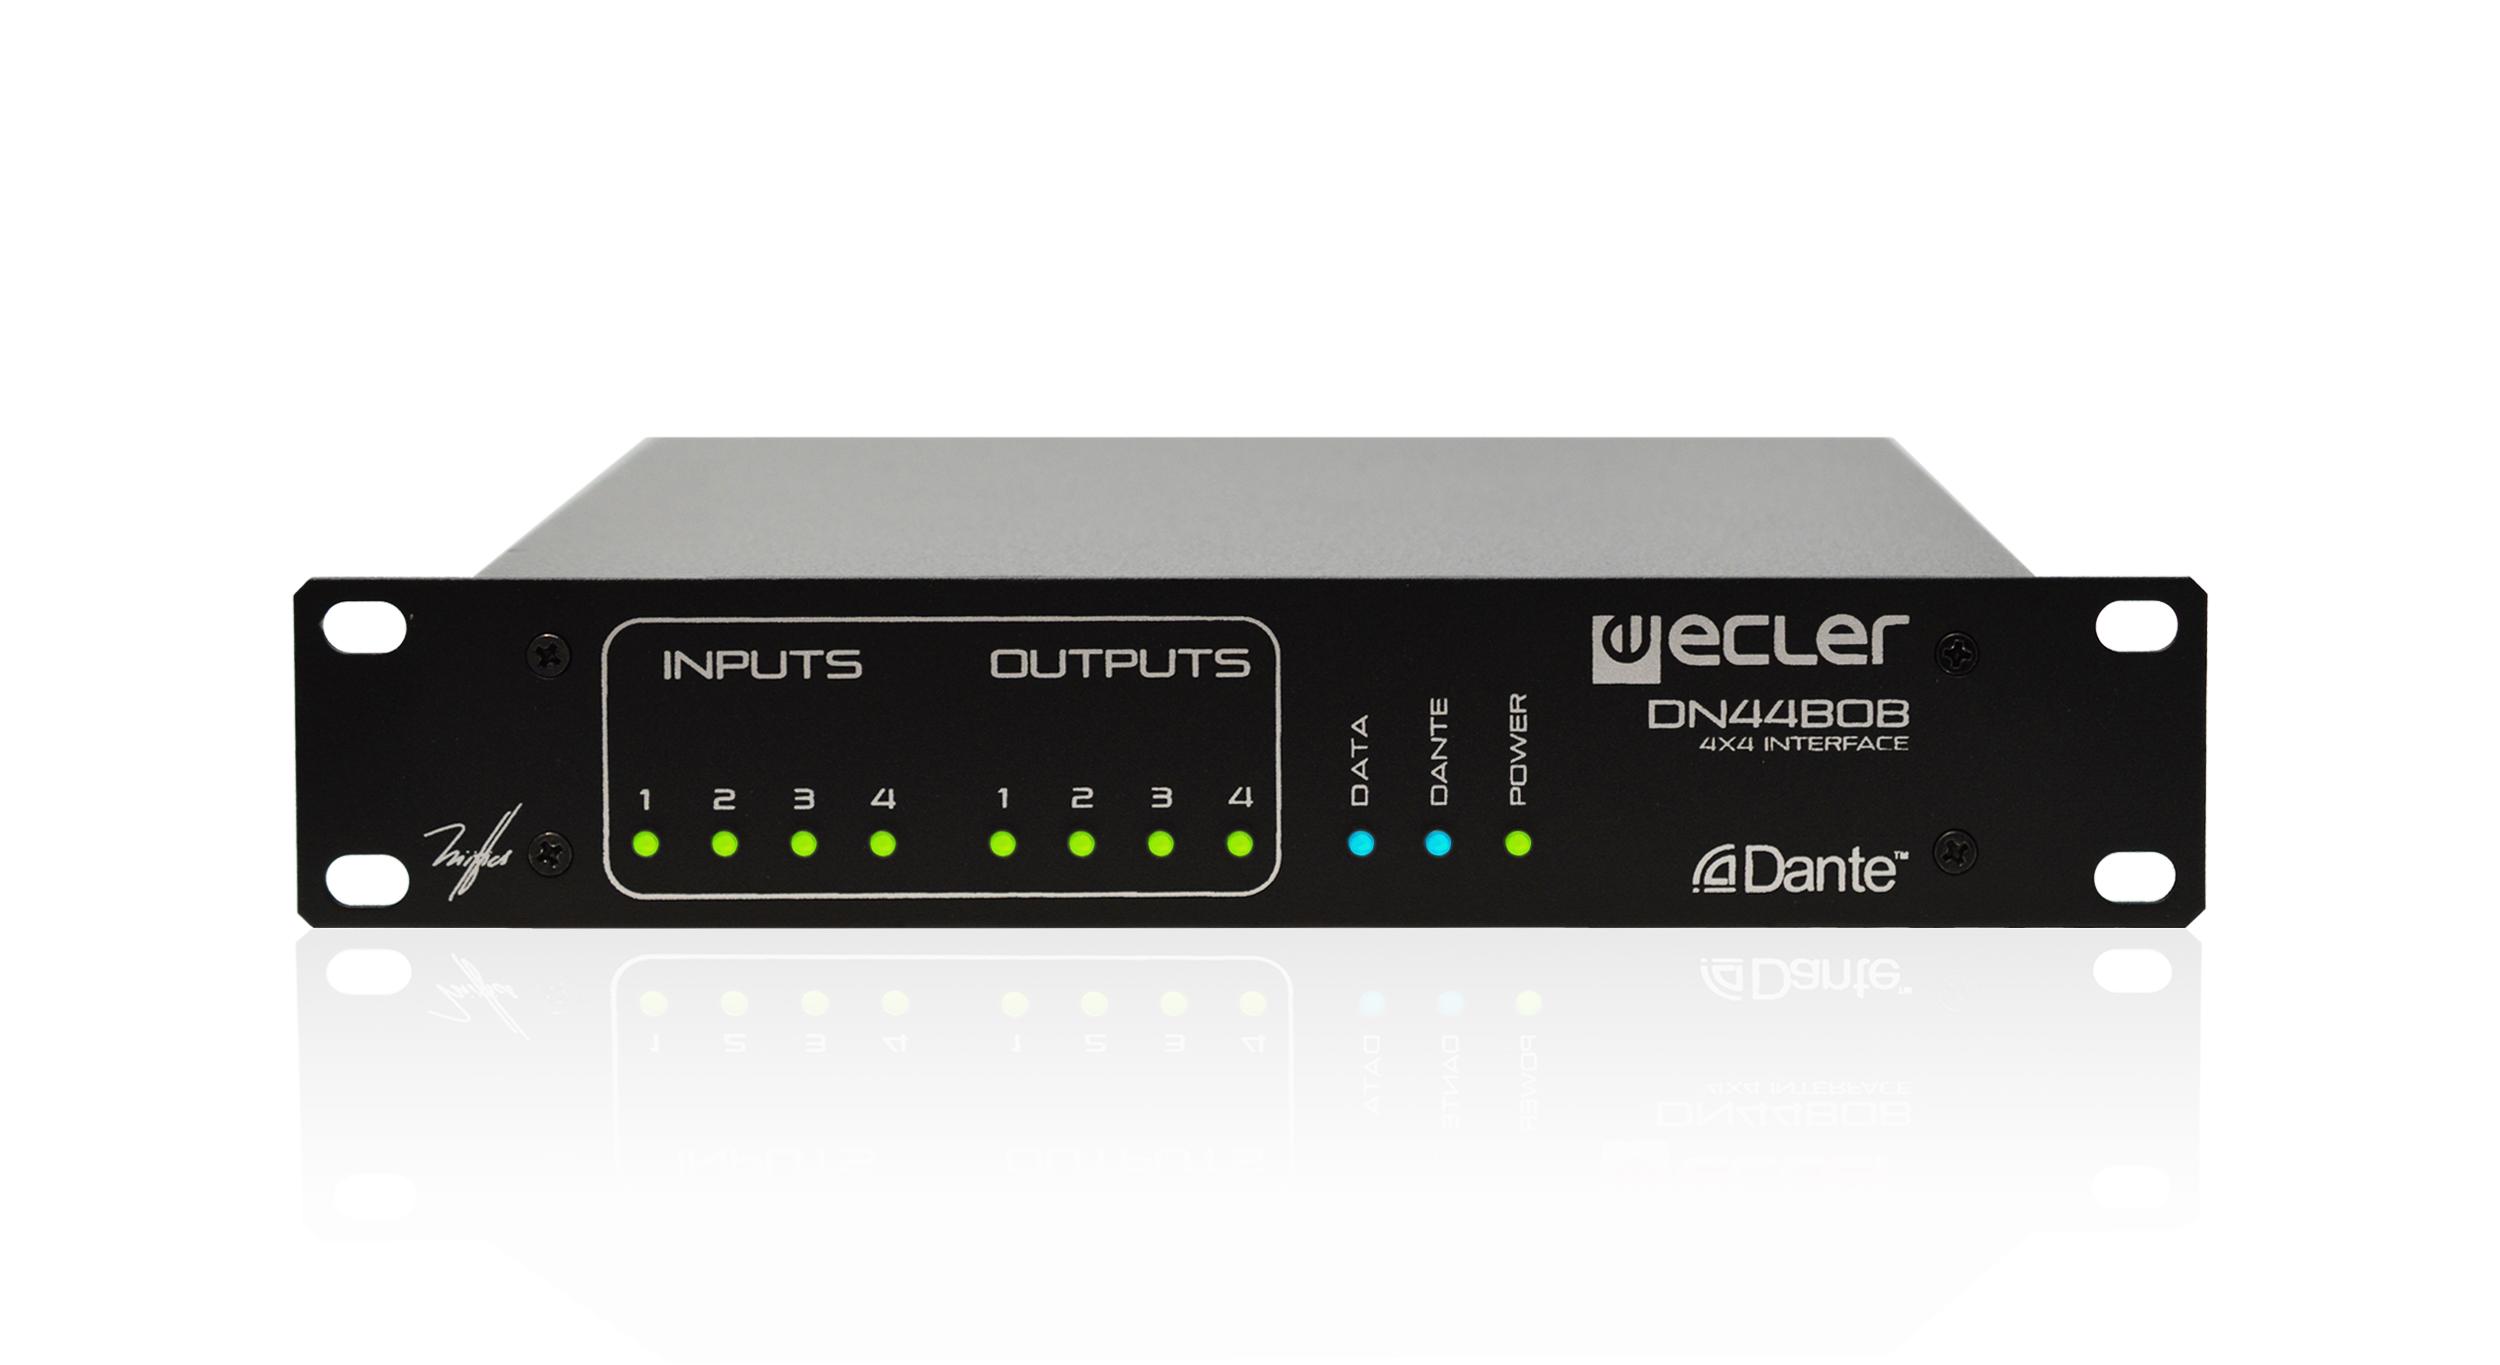 DANTE - Digital Audio Network - Audio over IP